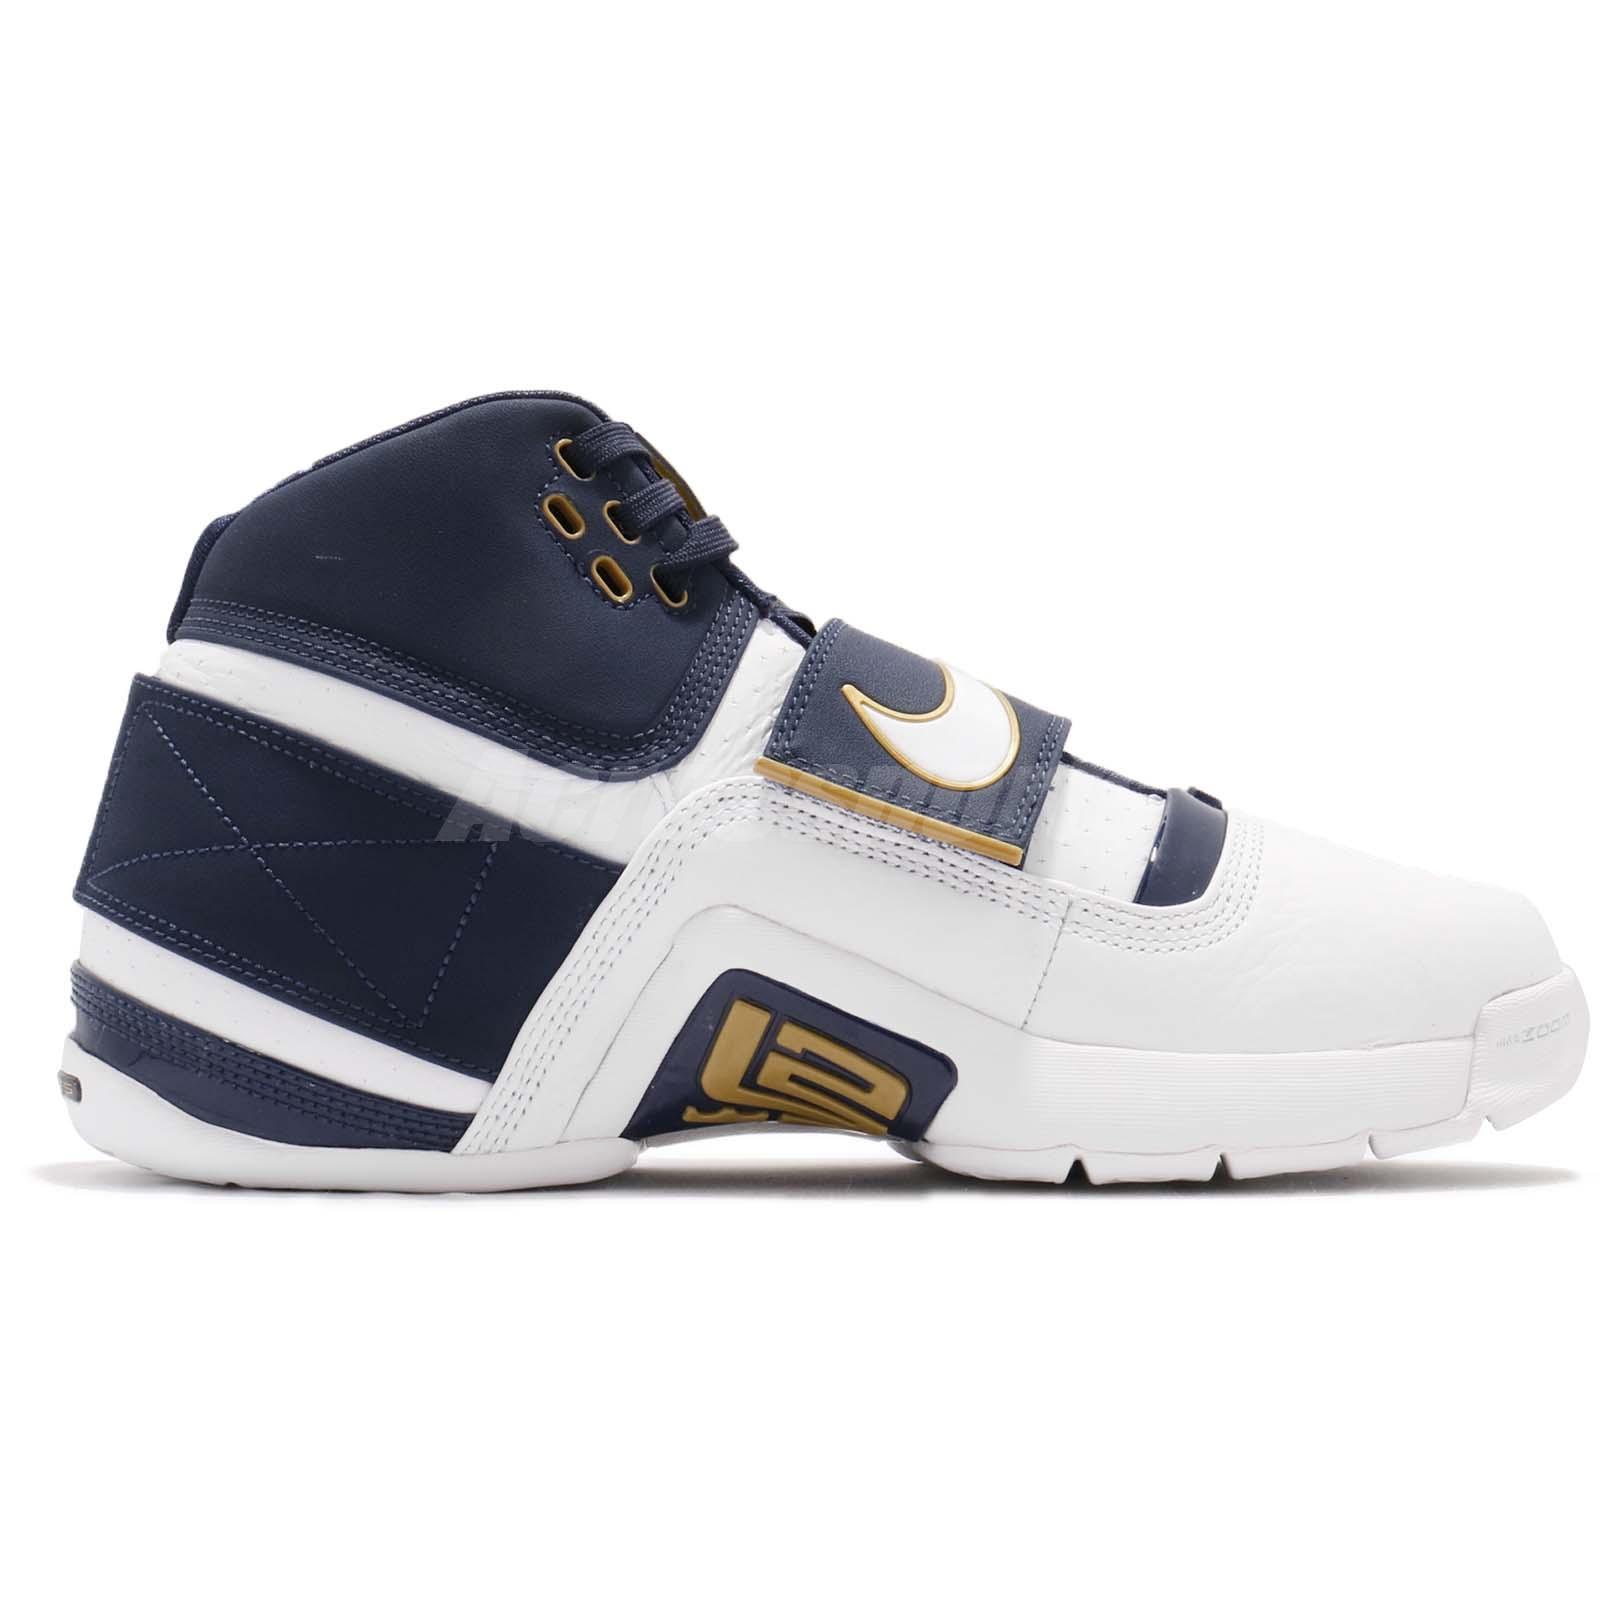 9ea61243c0d2e Nike Zoom LeBron Soldier CT16 QS 25 Straight James Navy White Men ...